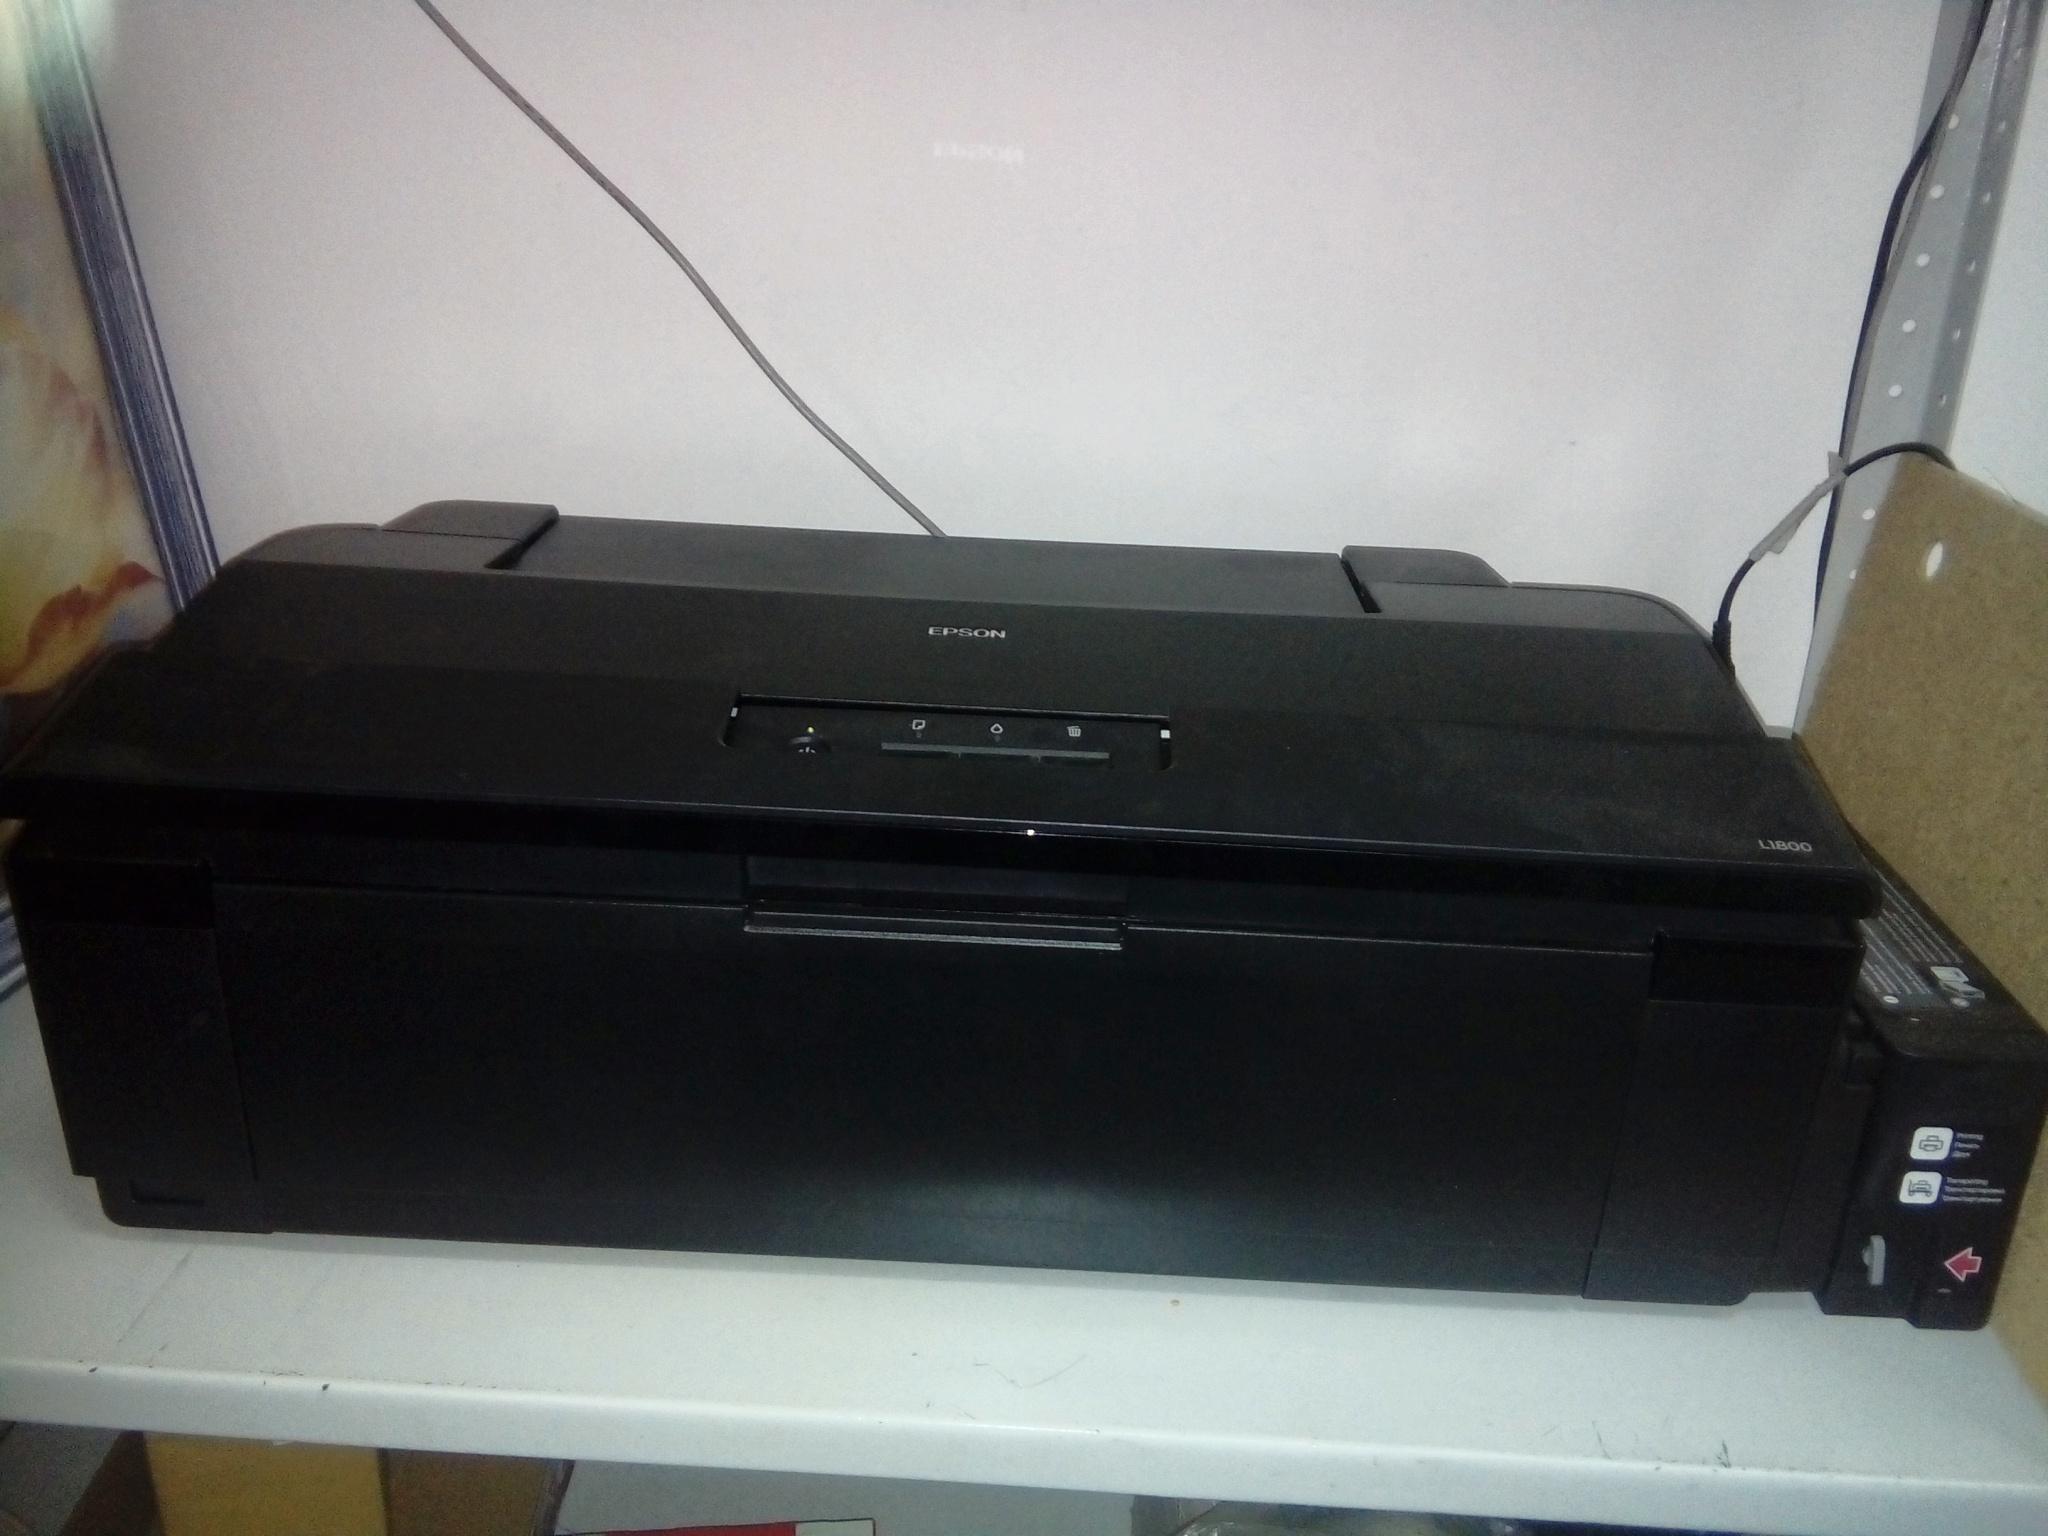 Epson L1800 Printer 1